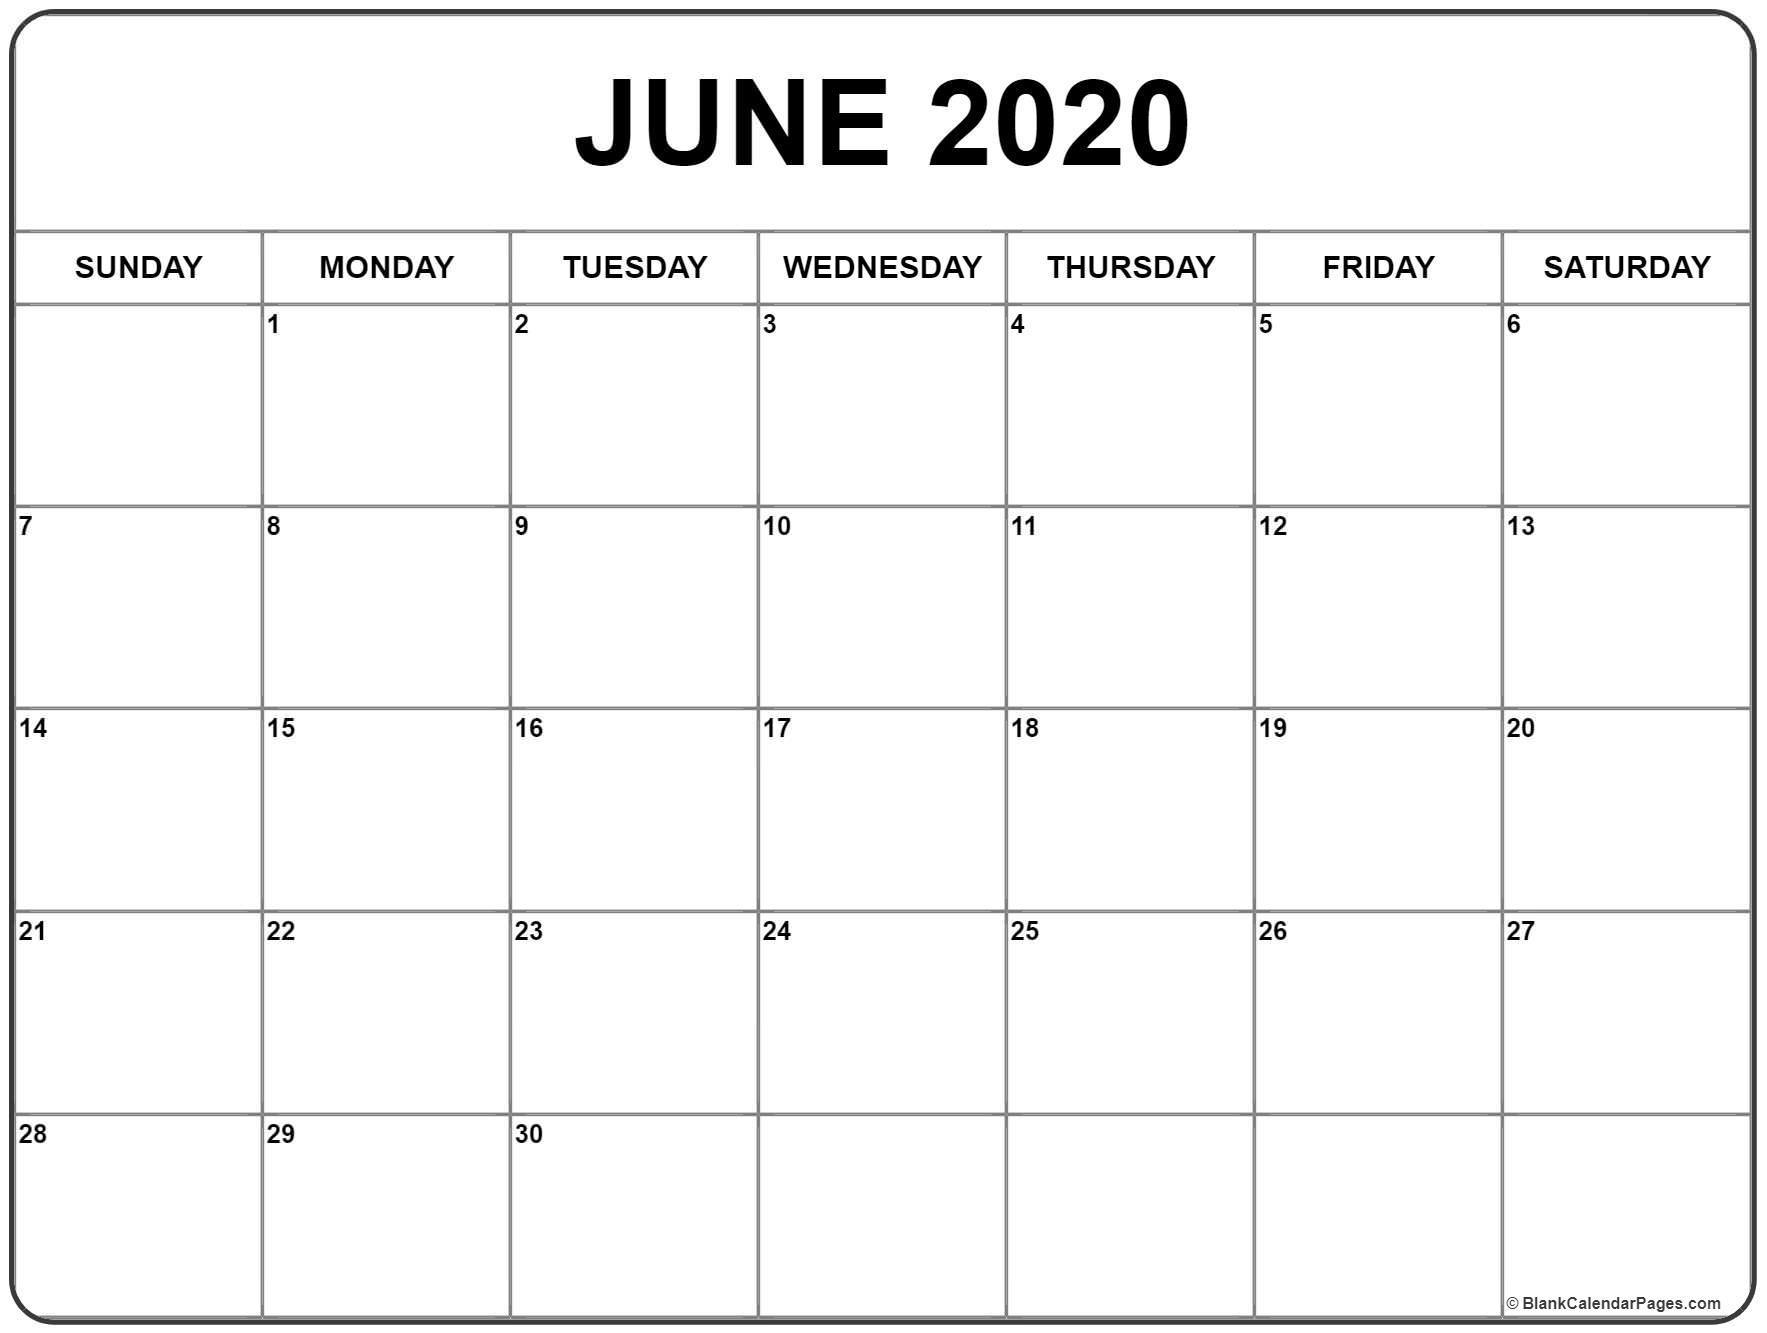 June 2020 Calendar | Free Printable Monthly Calendars pertaining to 2020 Calendar Free Printable With Space To Write